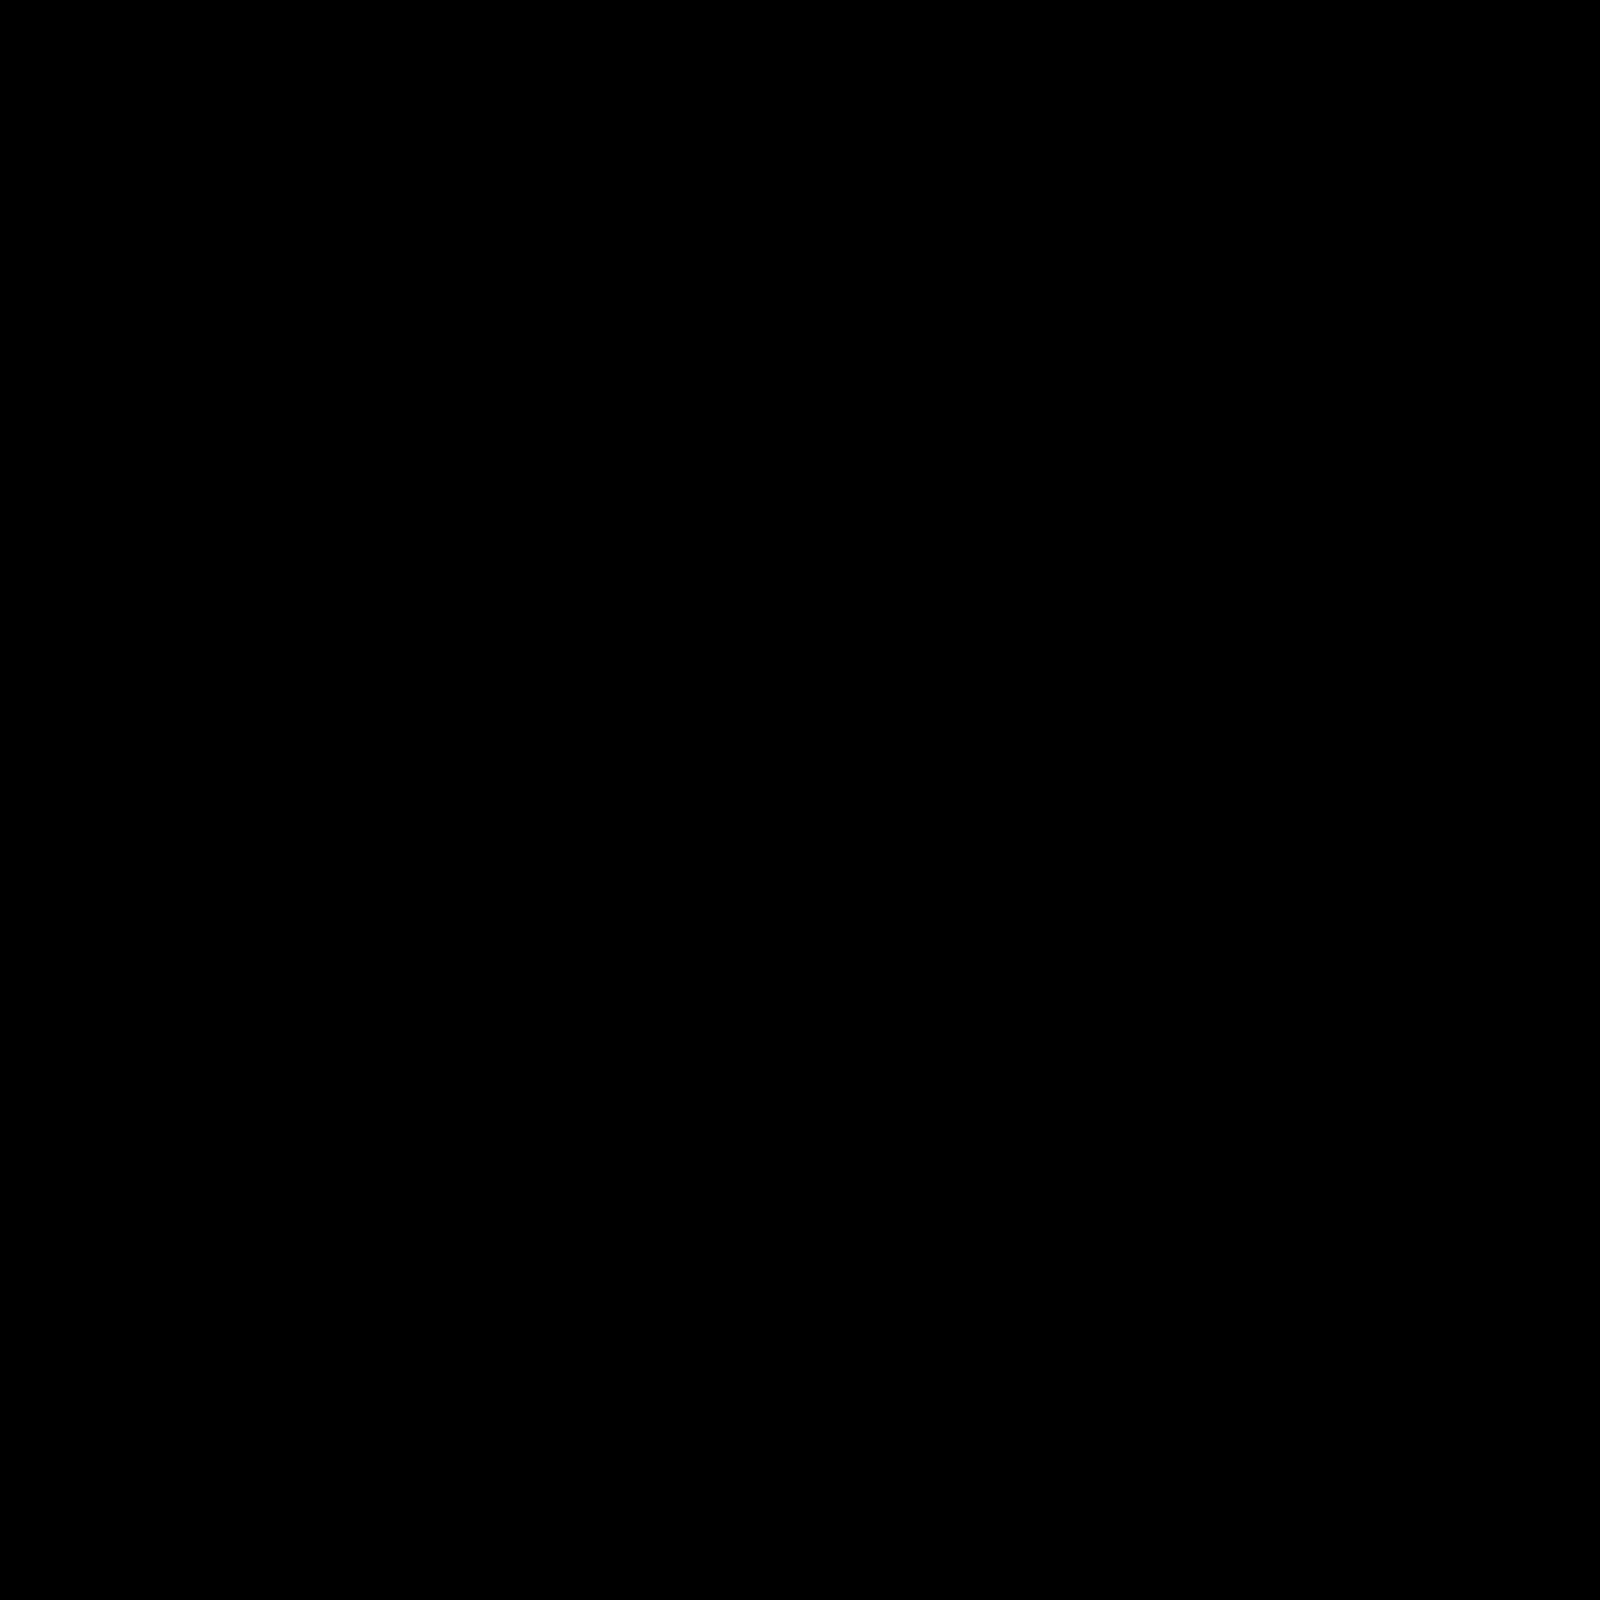 Maska wenecka wąsy